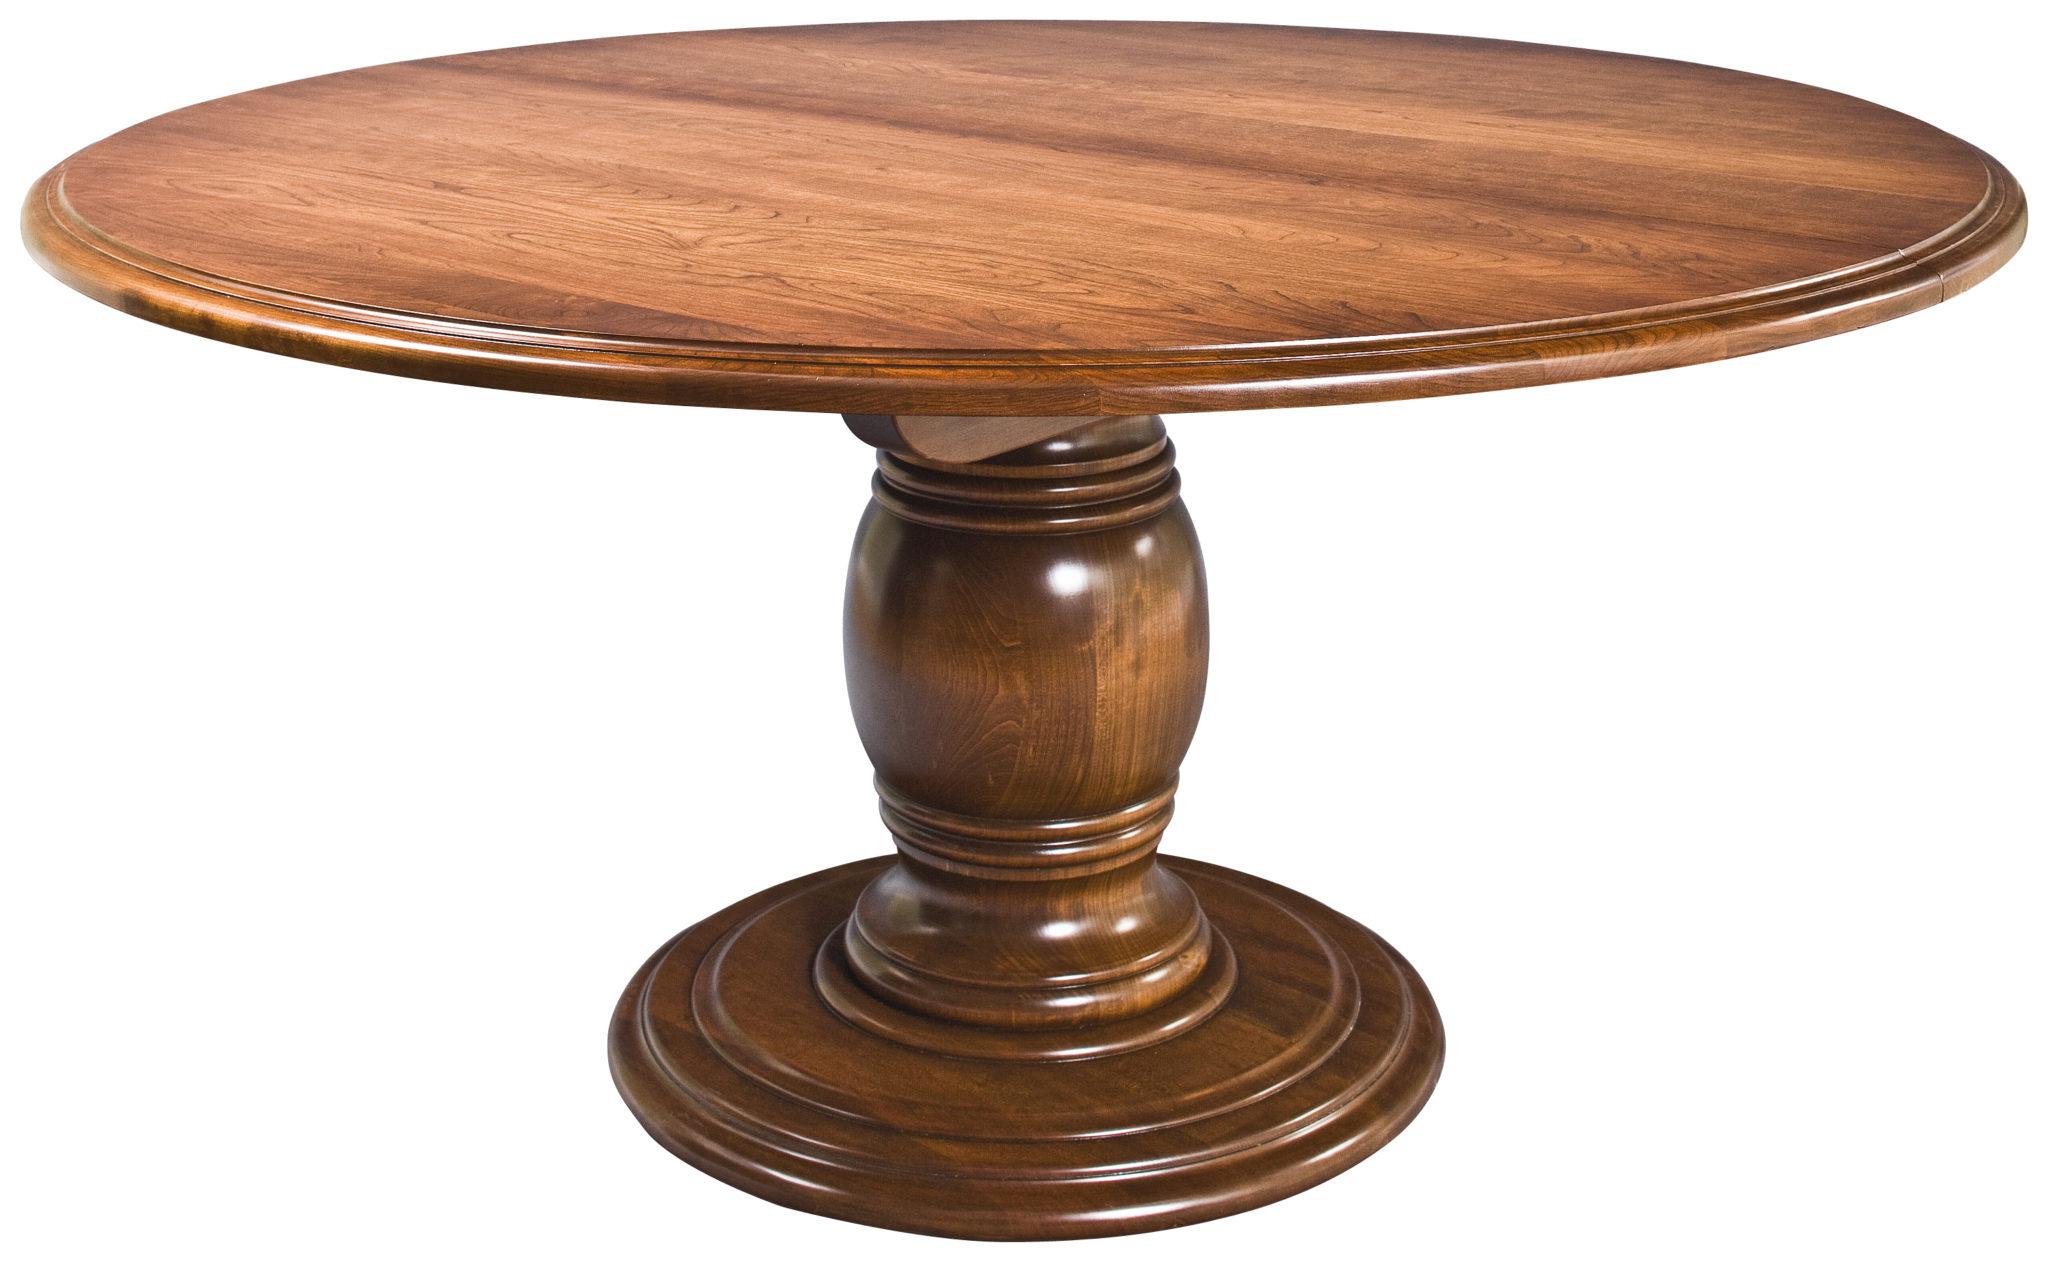 493-Vineyard-Single-Pedestal-Extension-Table-1.jpg